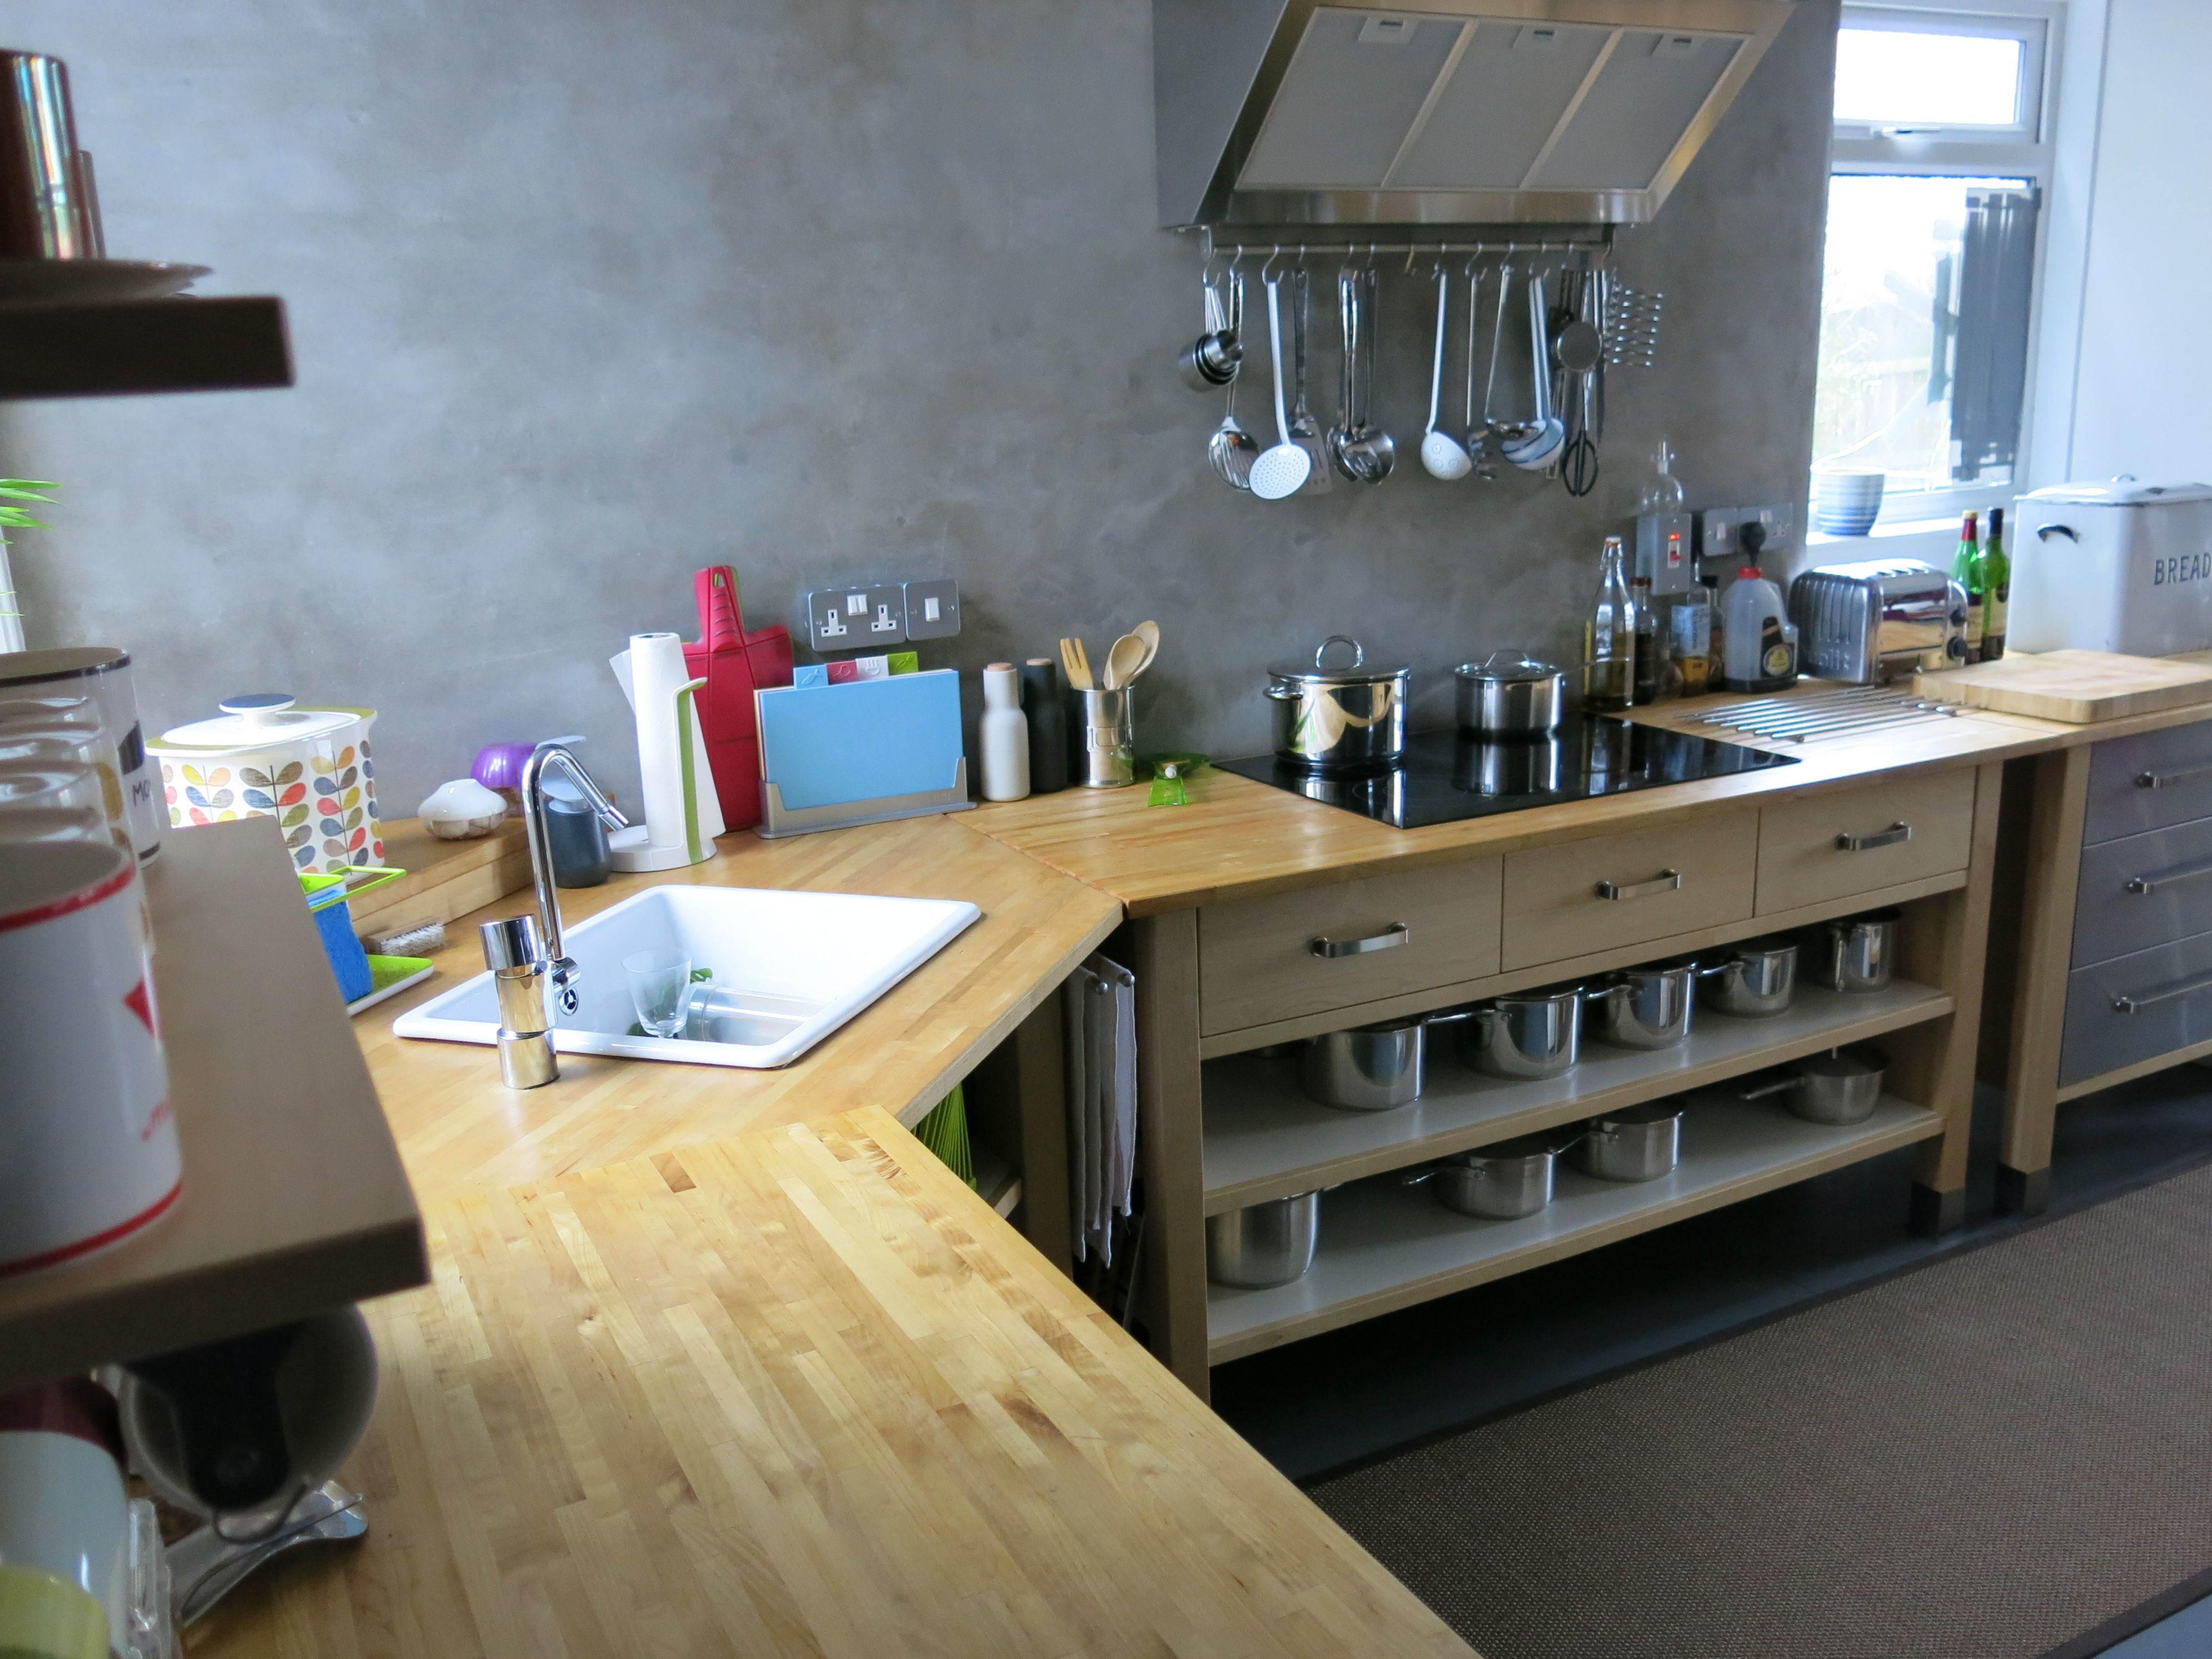 sink cut into an old ikea varde corner unit + hob cut into a varde ... - Cucina Varde Ikea